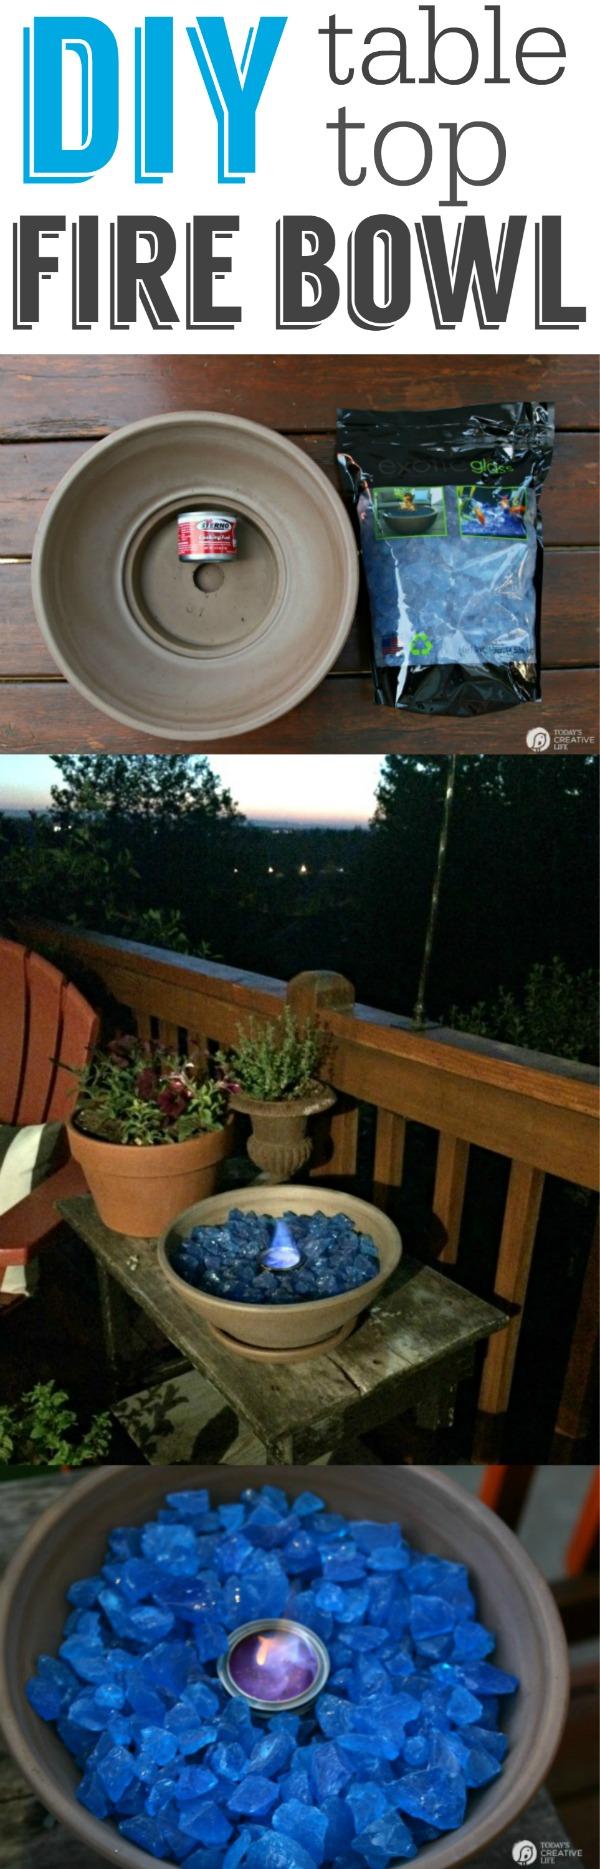 DIY Tabletop Fire Bowl.